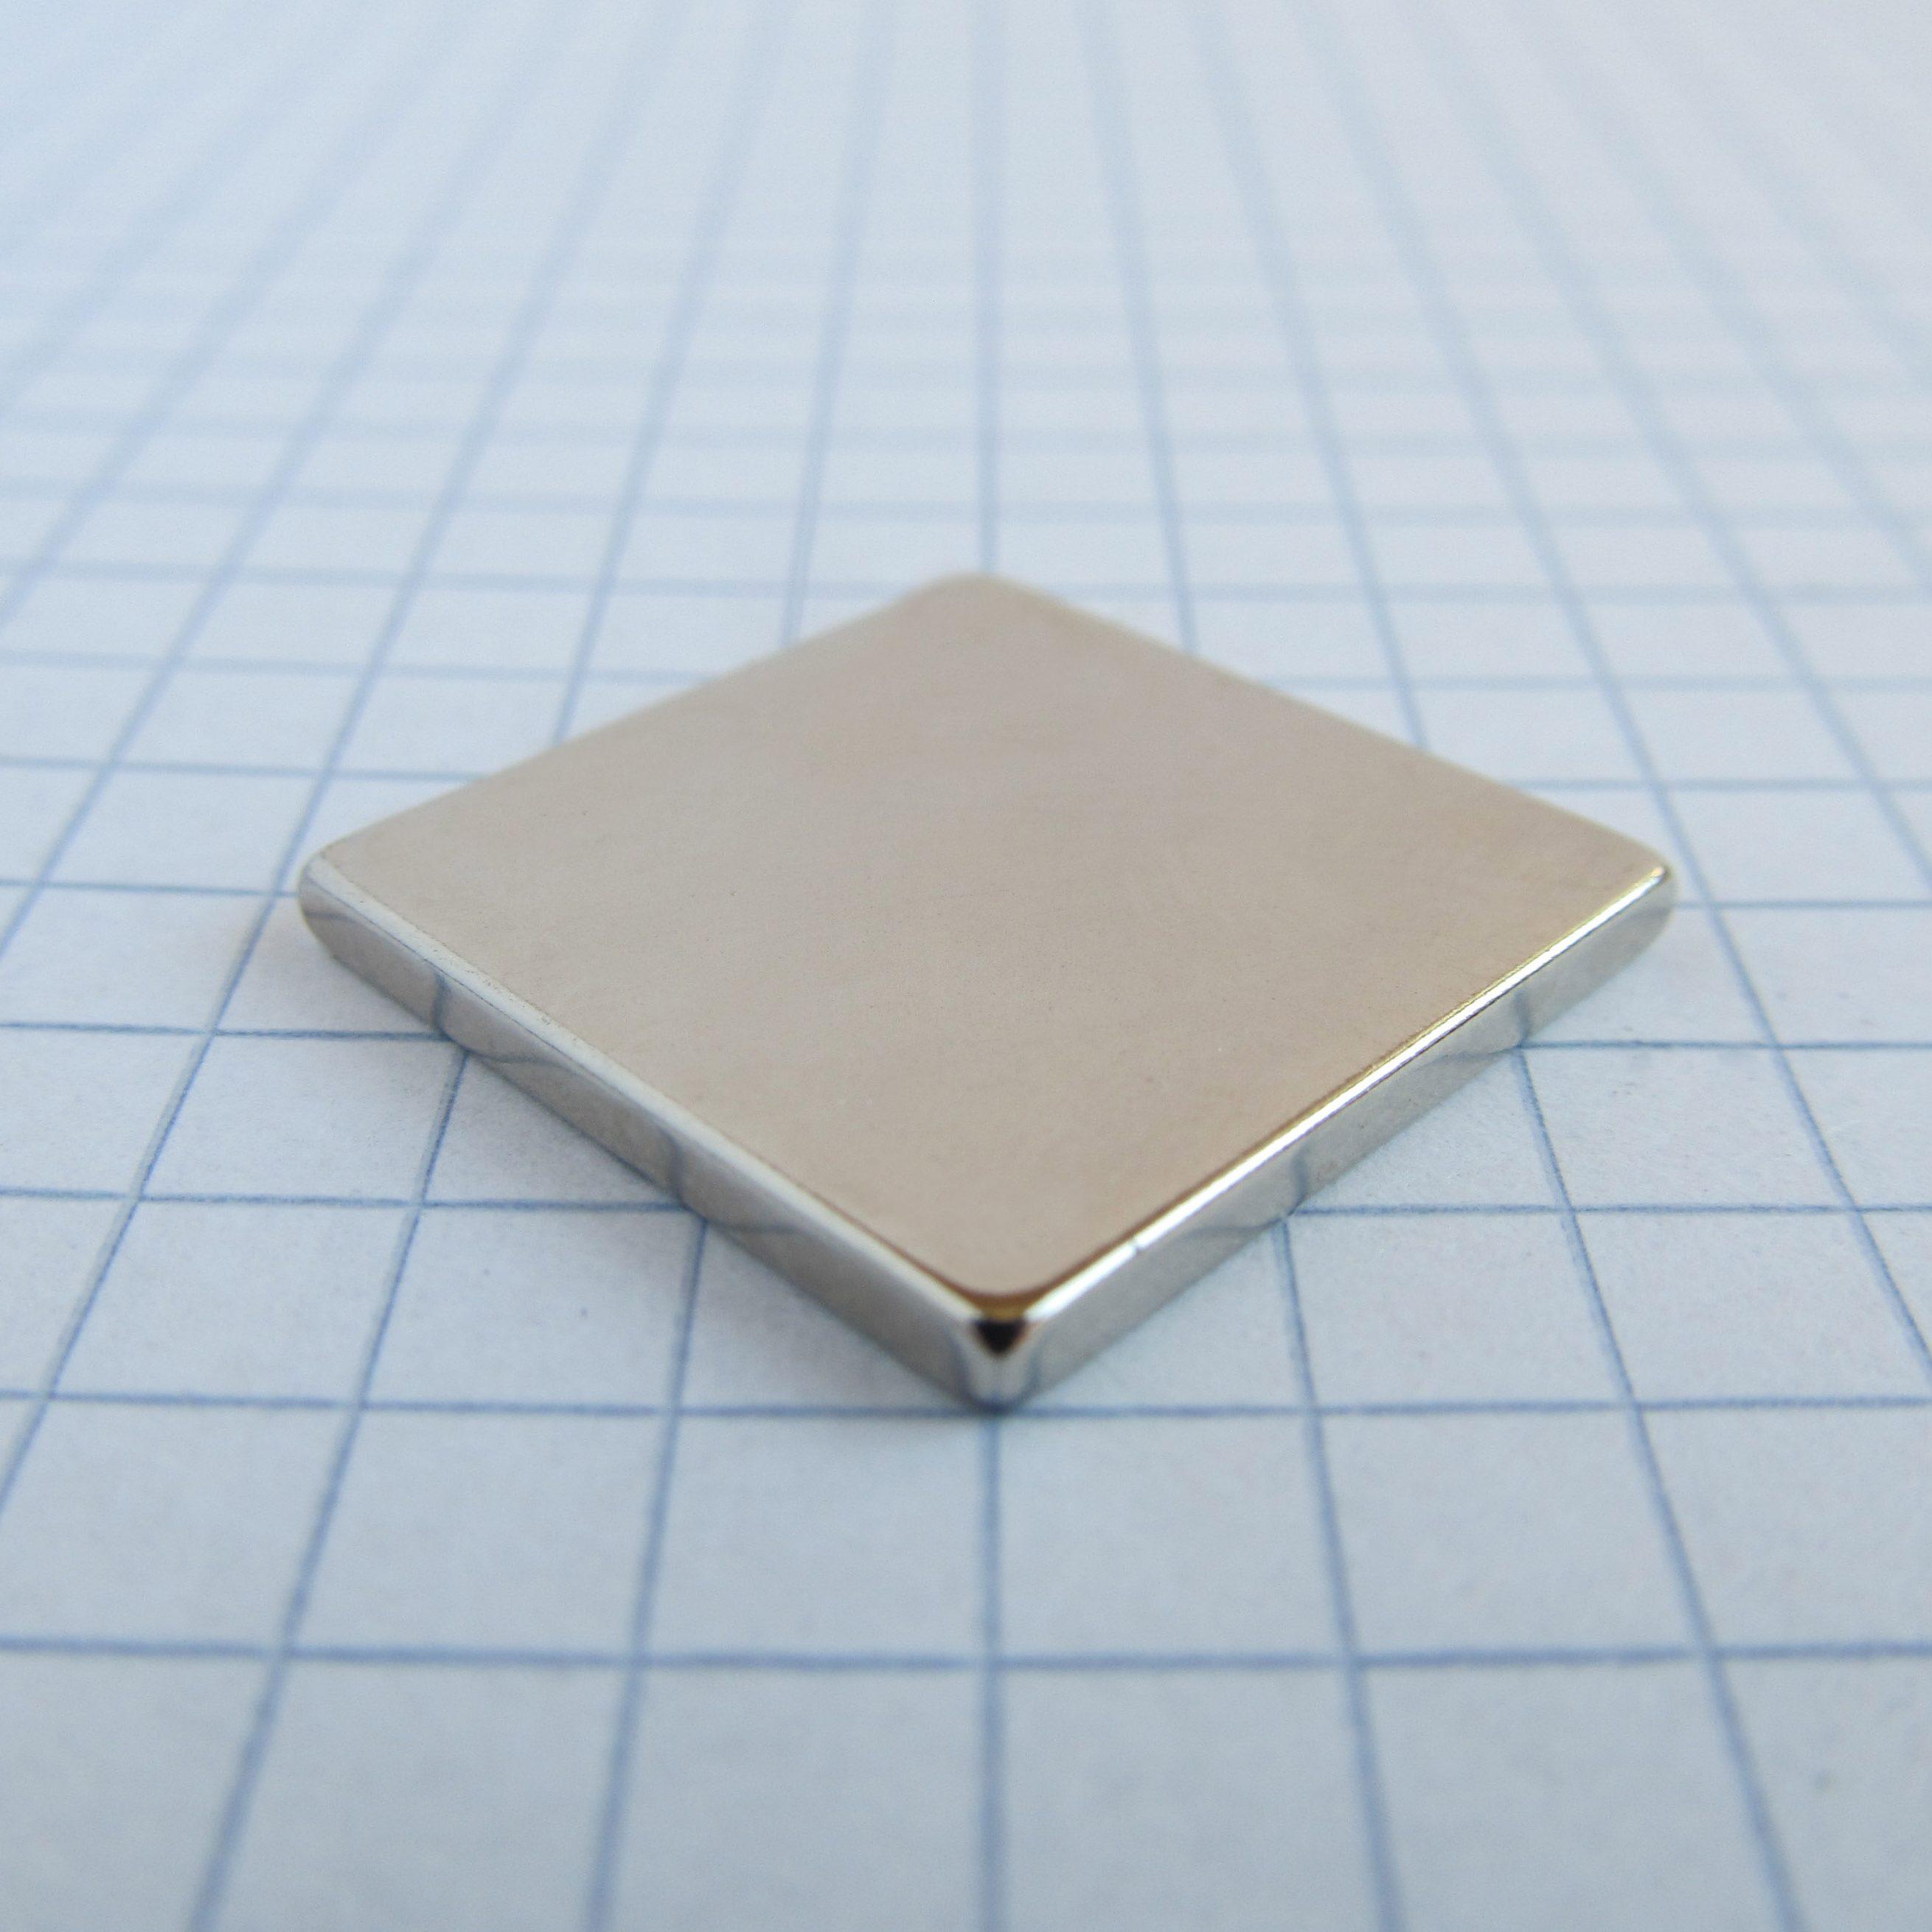 25x25x2-neodym-kvader